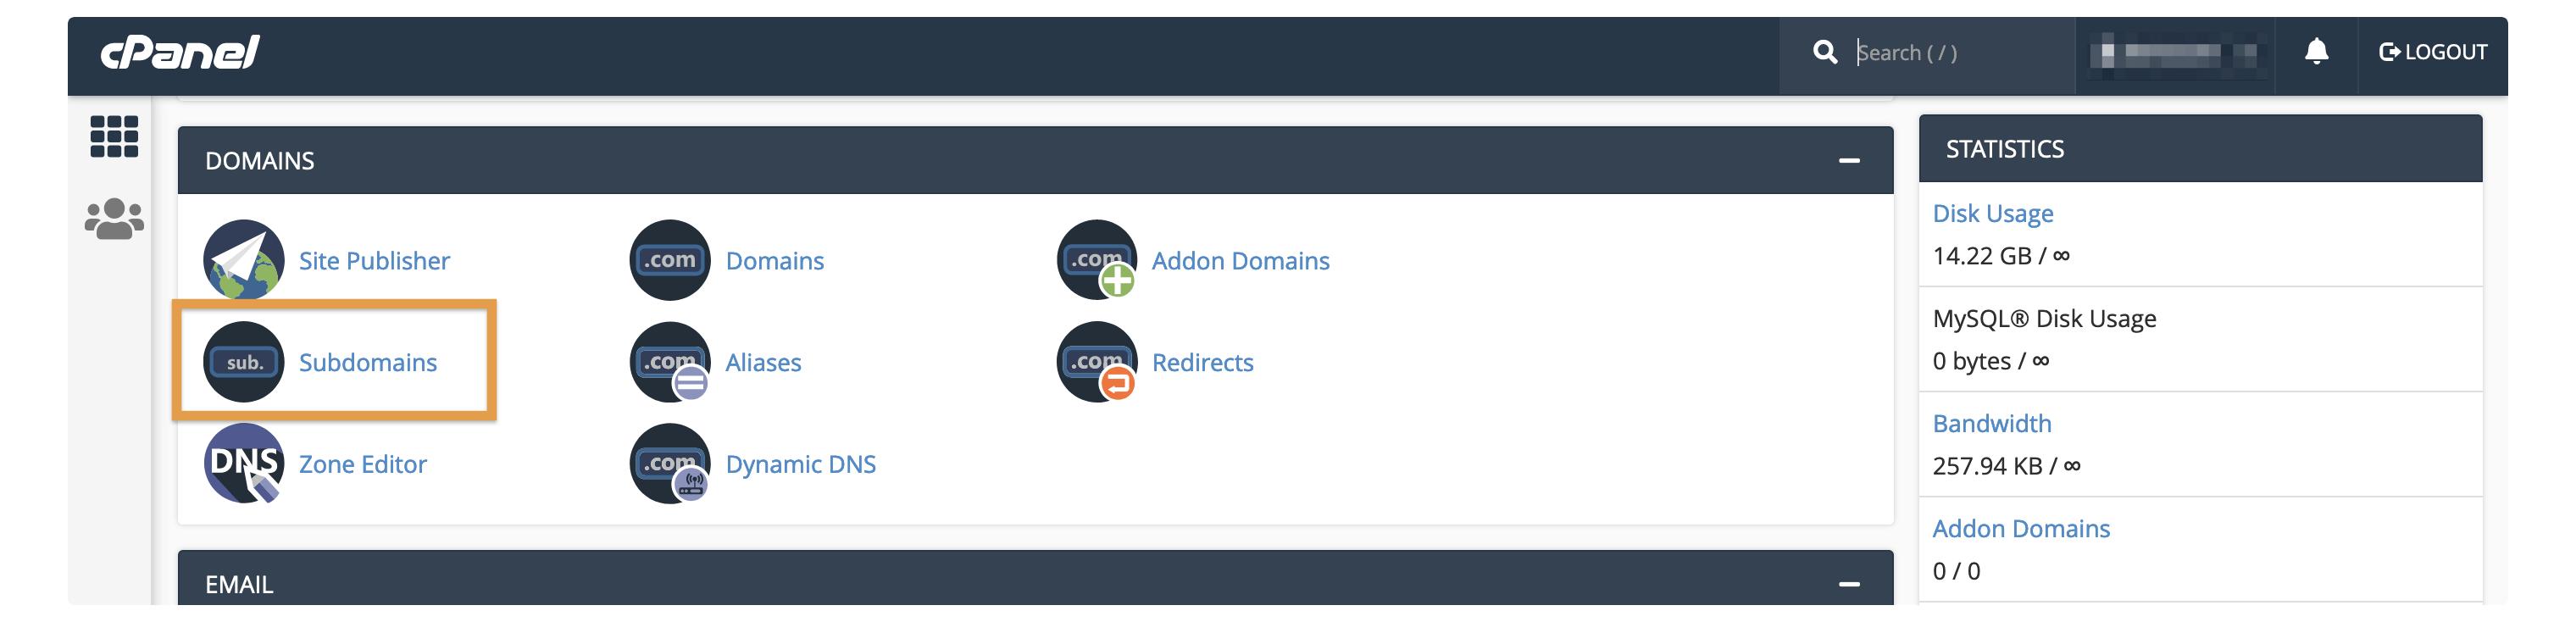 cPanel's Subdomains option.